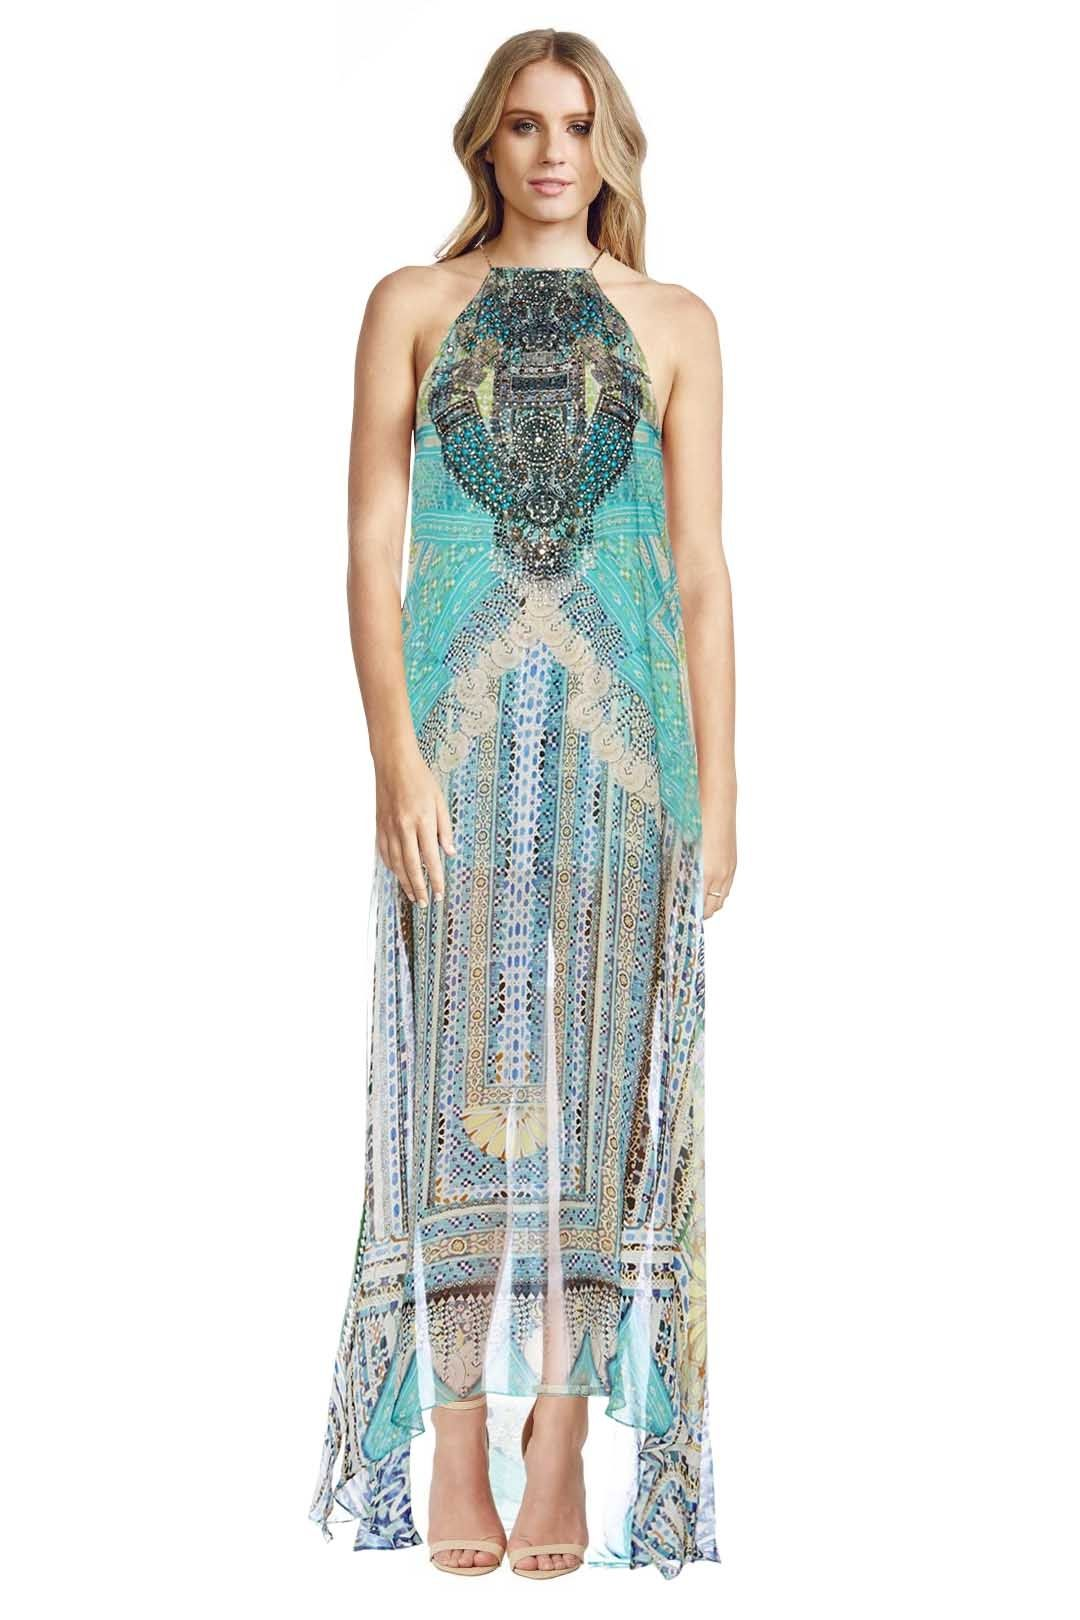 Camilla - Topkapi Thread Sheer Overlay Dress - Prints - Front